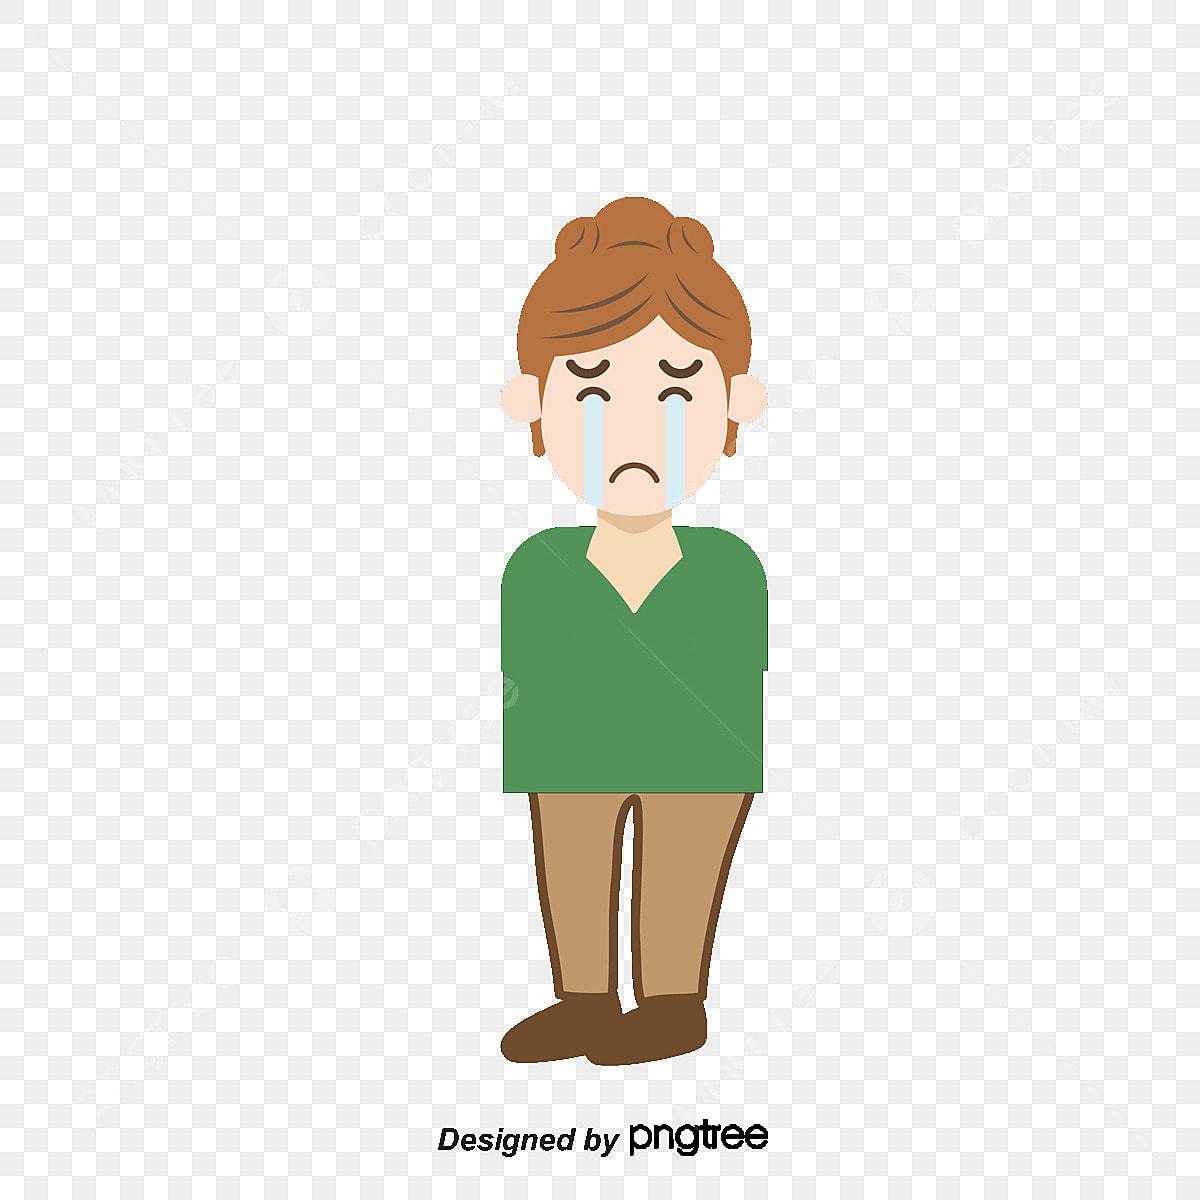 Cartoon Fille Pleure Dessin De Pleurer Fille Triste Png